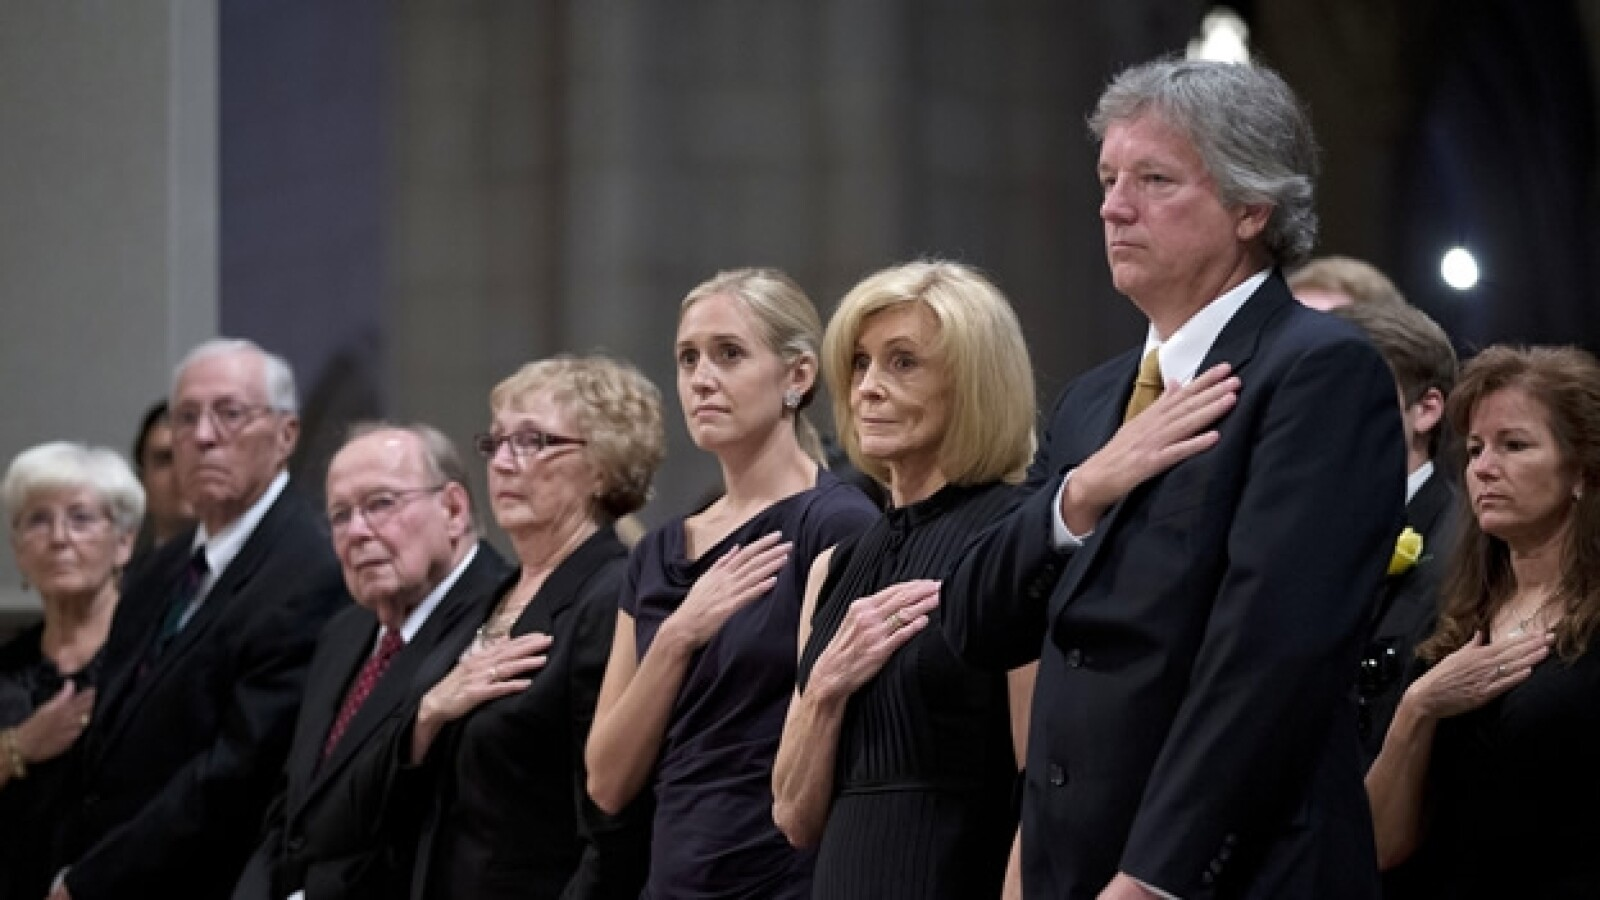 ceremonia de honor